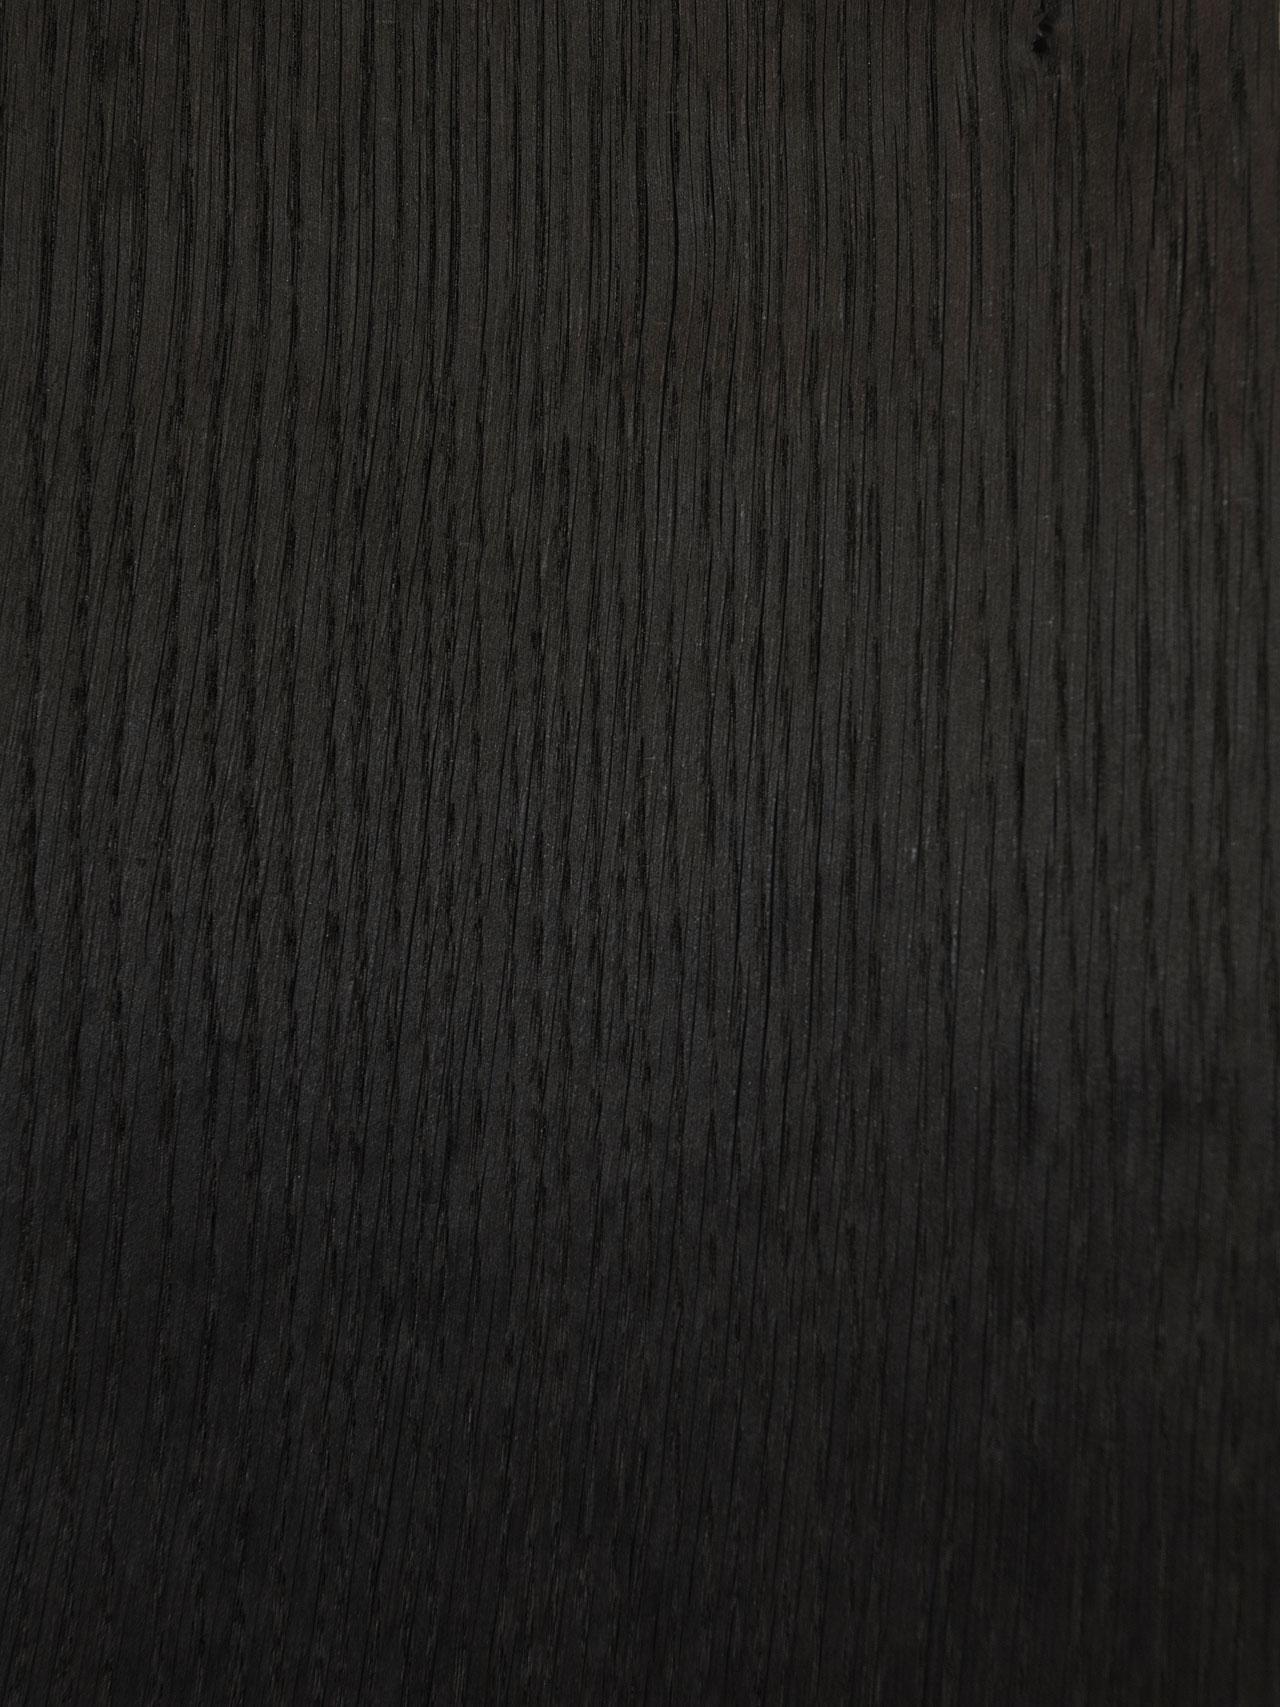 Chapa Roble Europeo Mallado Ahumado Losán